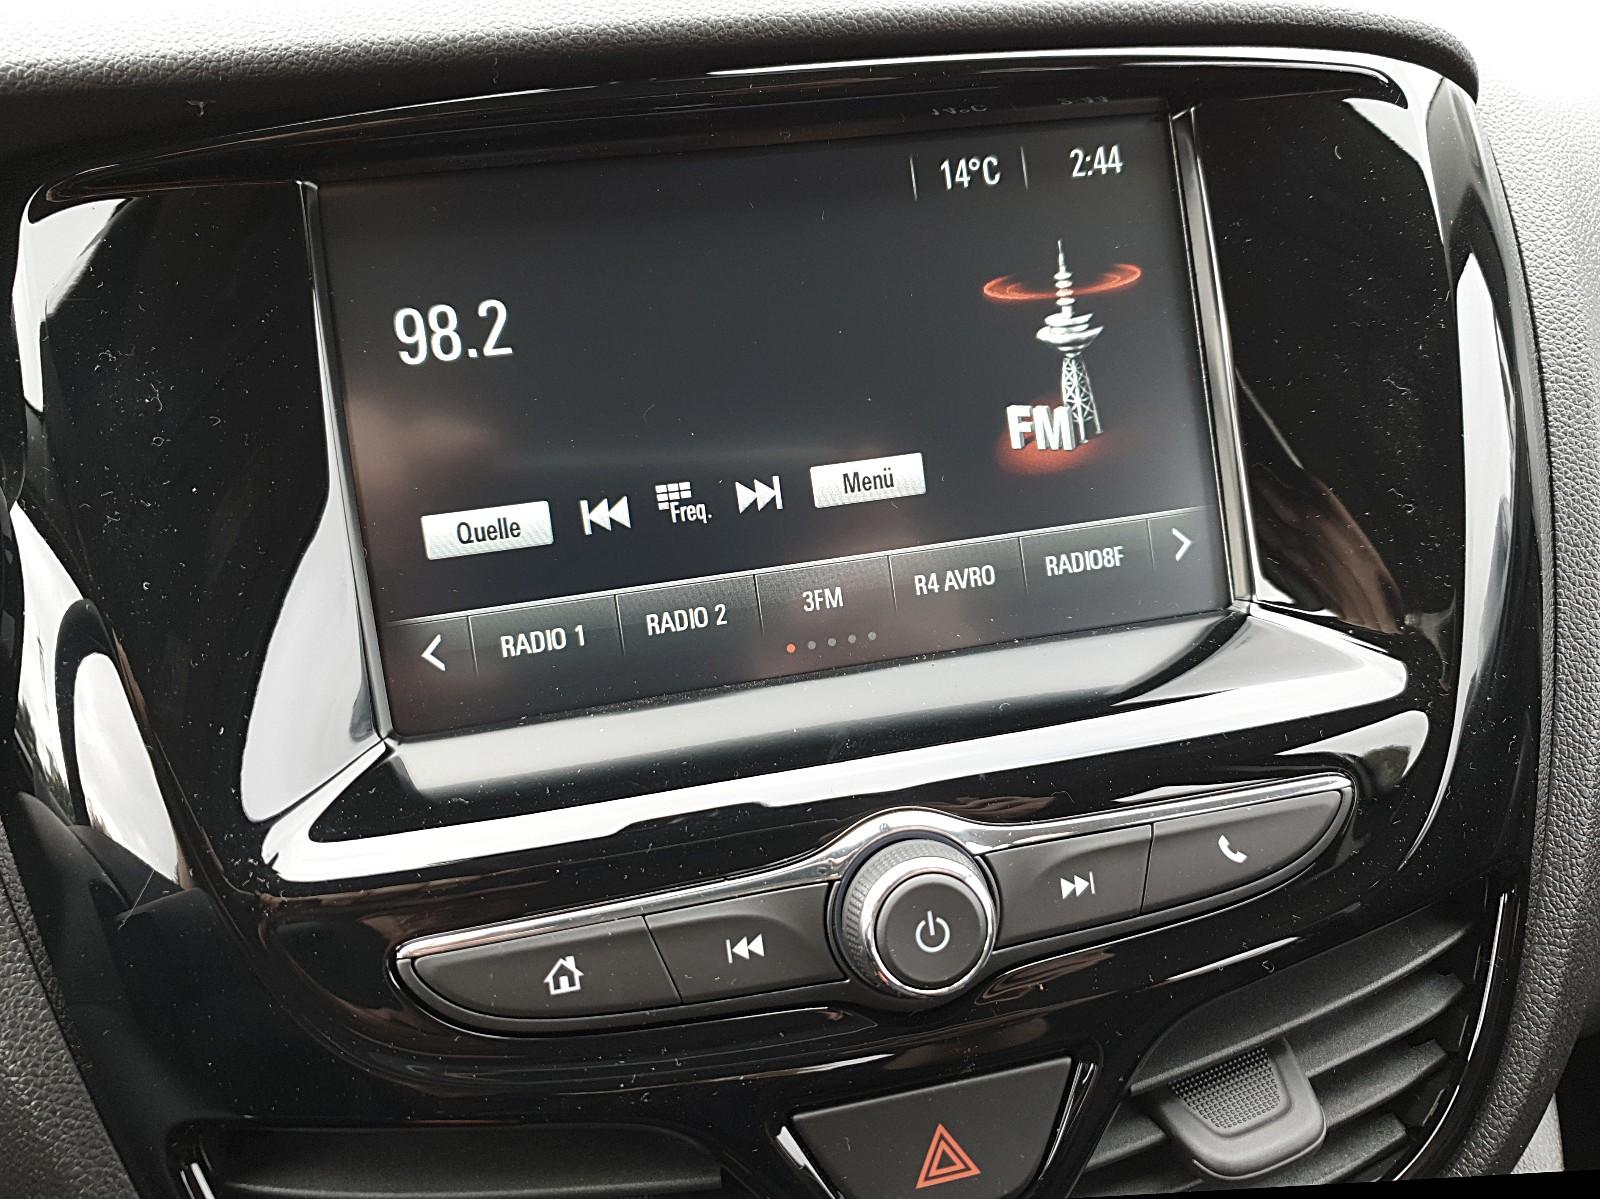 OPEL KARL 1.0 73PS 120 Jahre 5-Türig Navi Klima PDC Nebelsch. Bluetooth Te Viscaal Fahrzeuggrosshandel GmbH, D-49847 Itterbeck